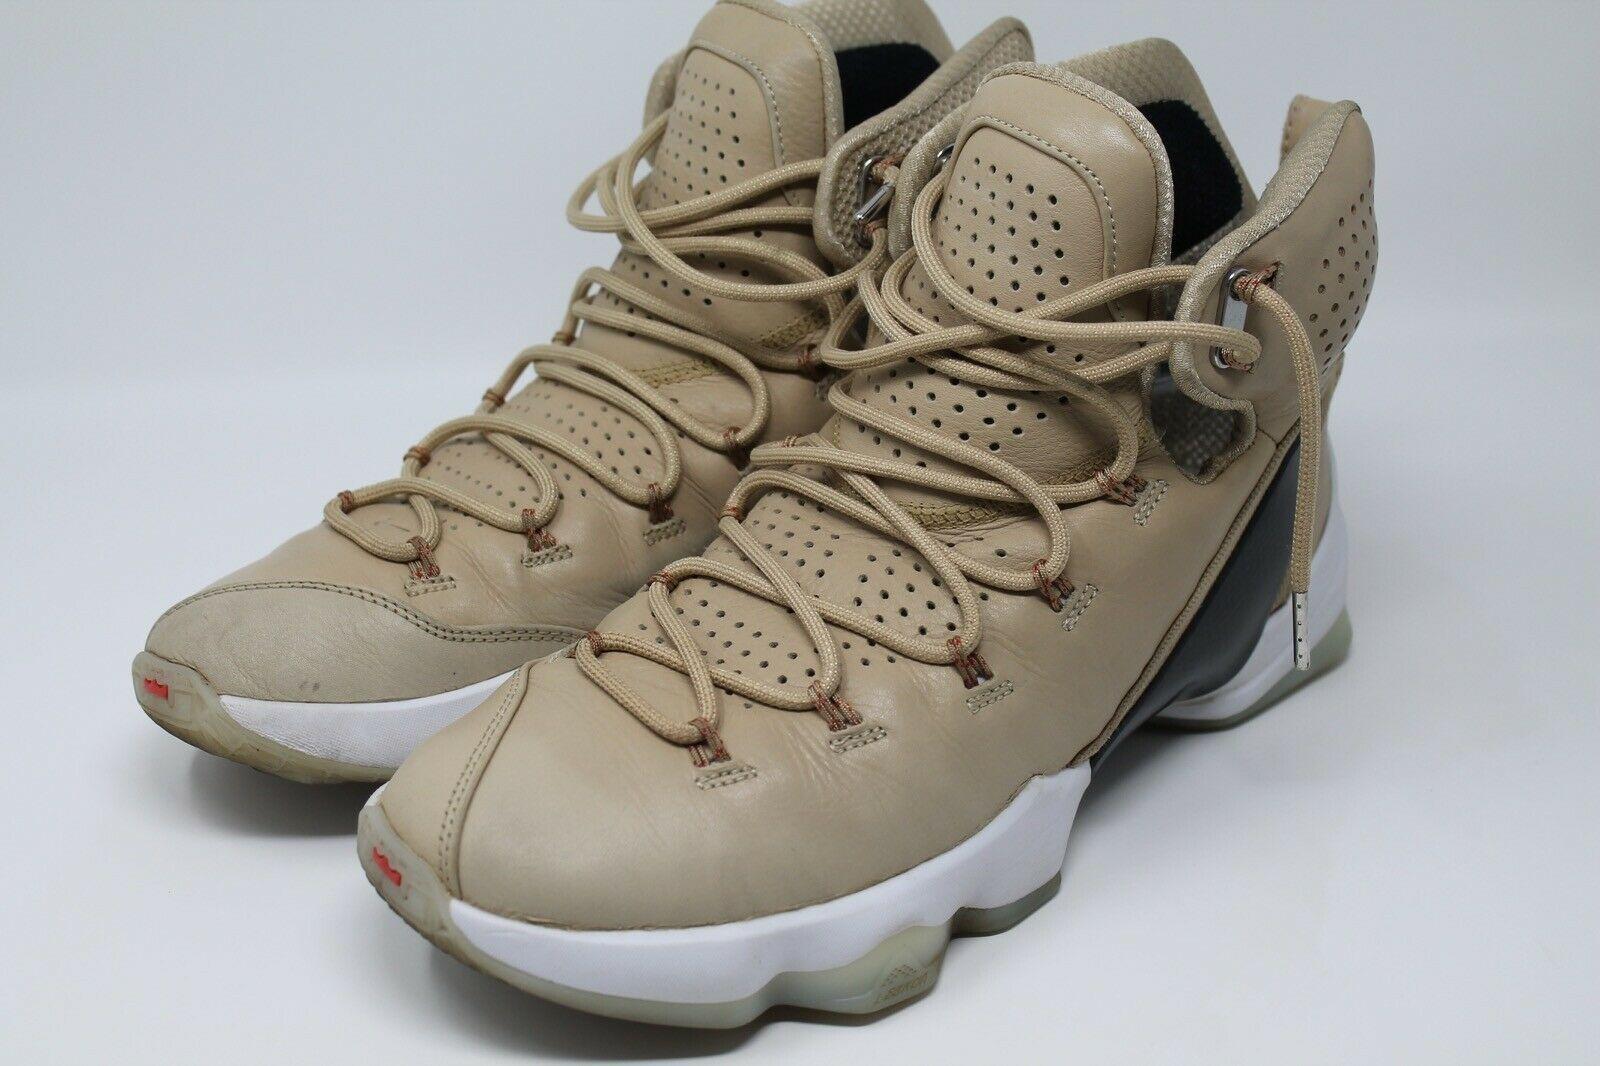 3ee9230371 NIKE LeBron XIII 13 Elite LB Mens Basketball and 50 similar items